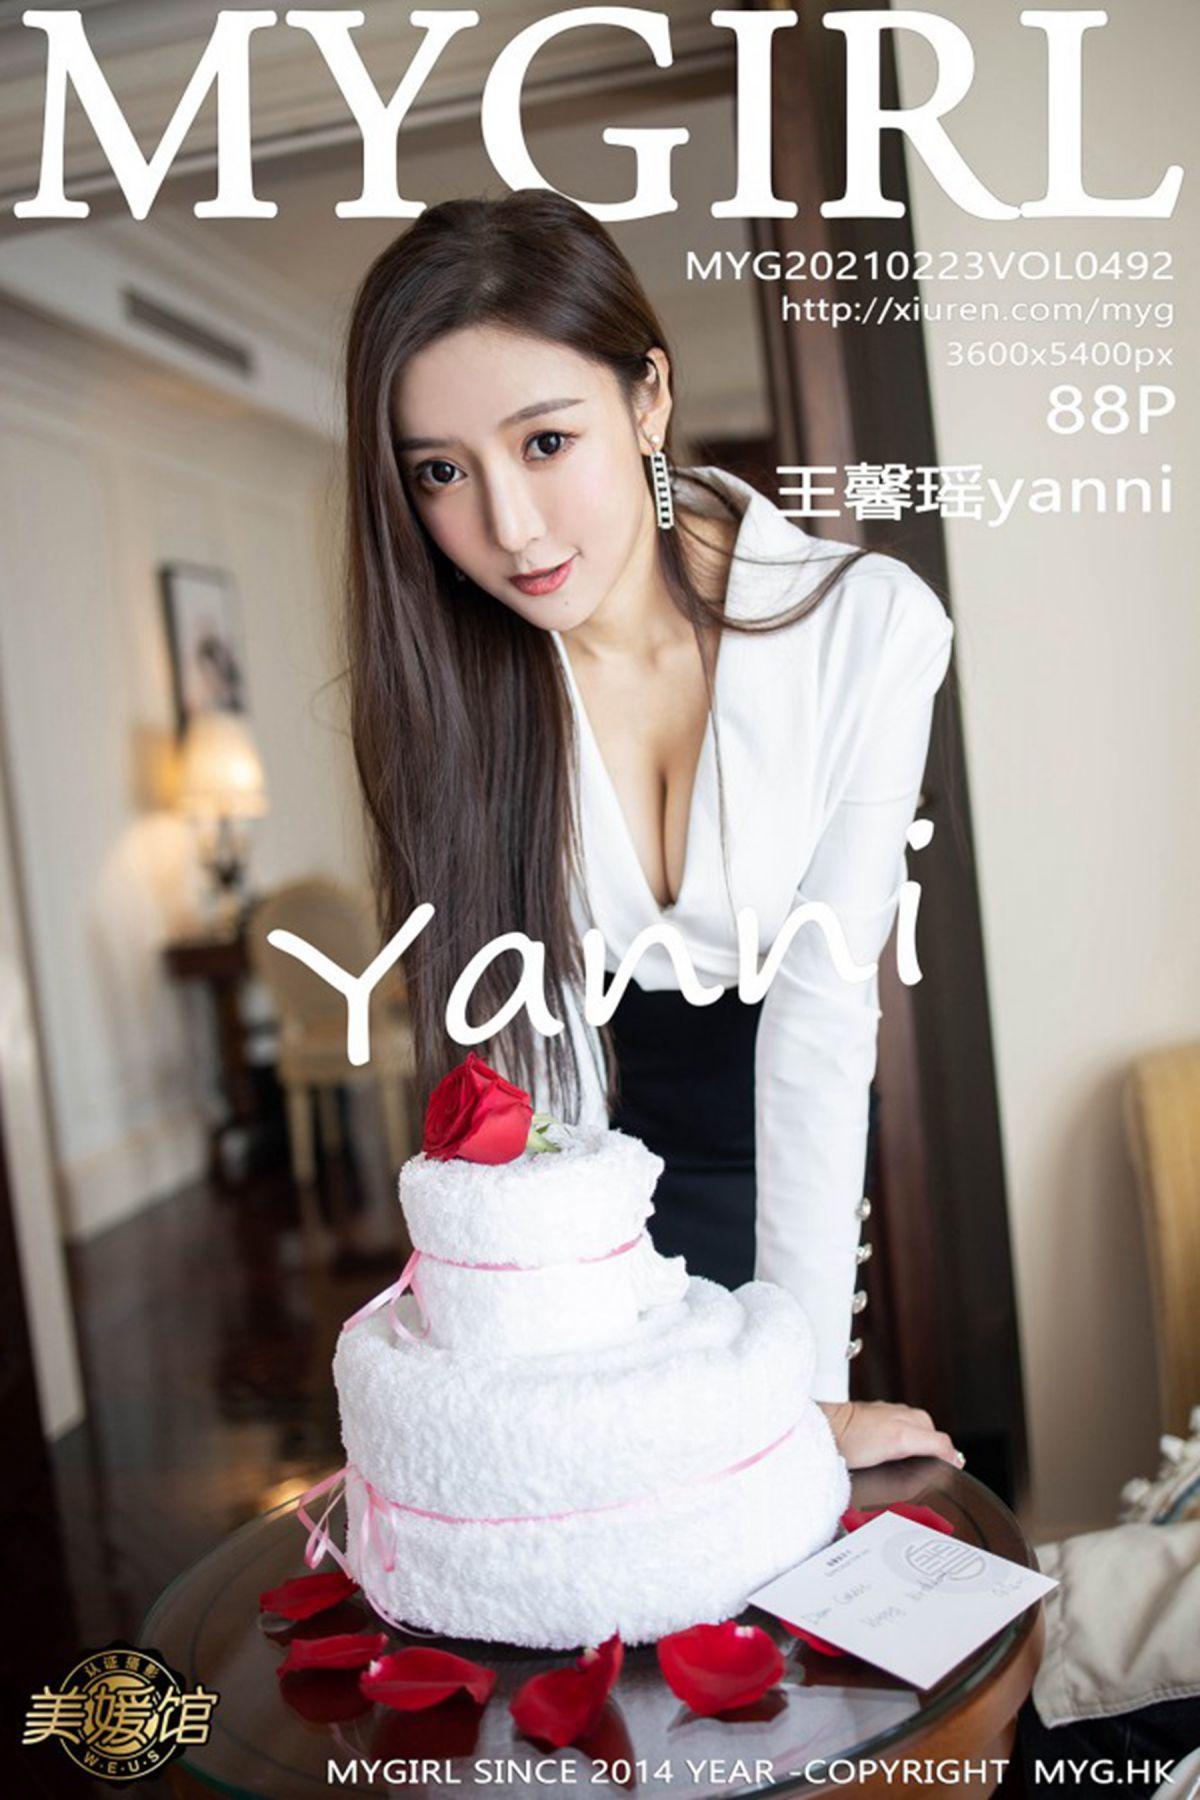 MyGirl美媛馆 Vol.492 Wang Xin Yao